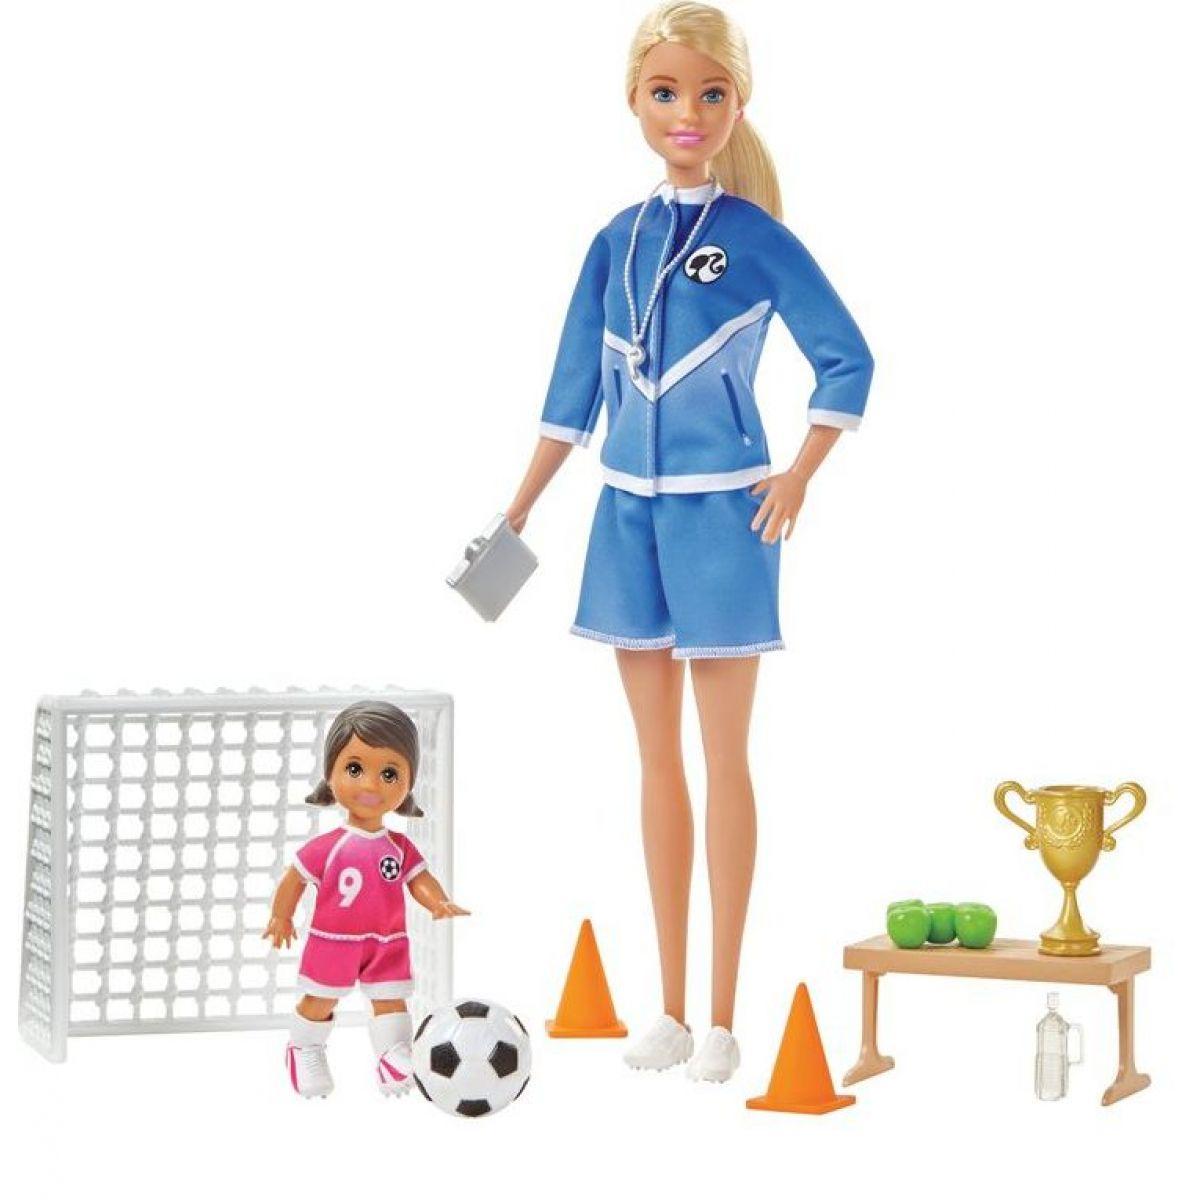 Mattel Barbie futbalová trénerka s bábikou herné set blond trénerka